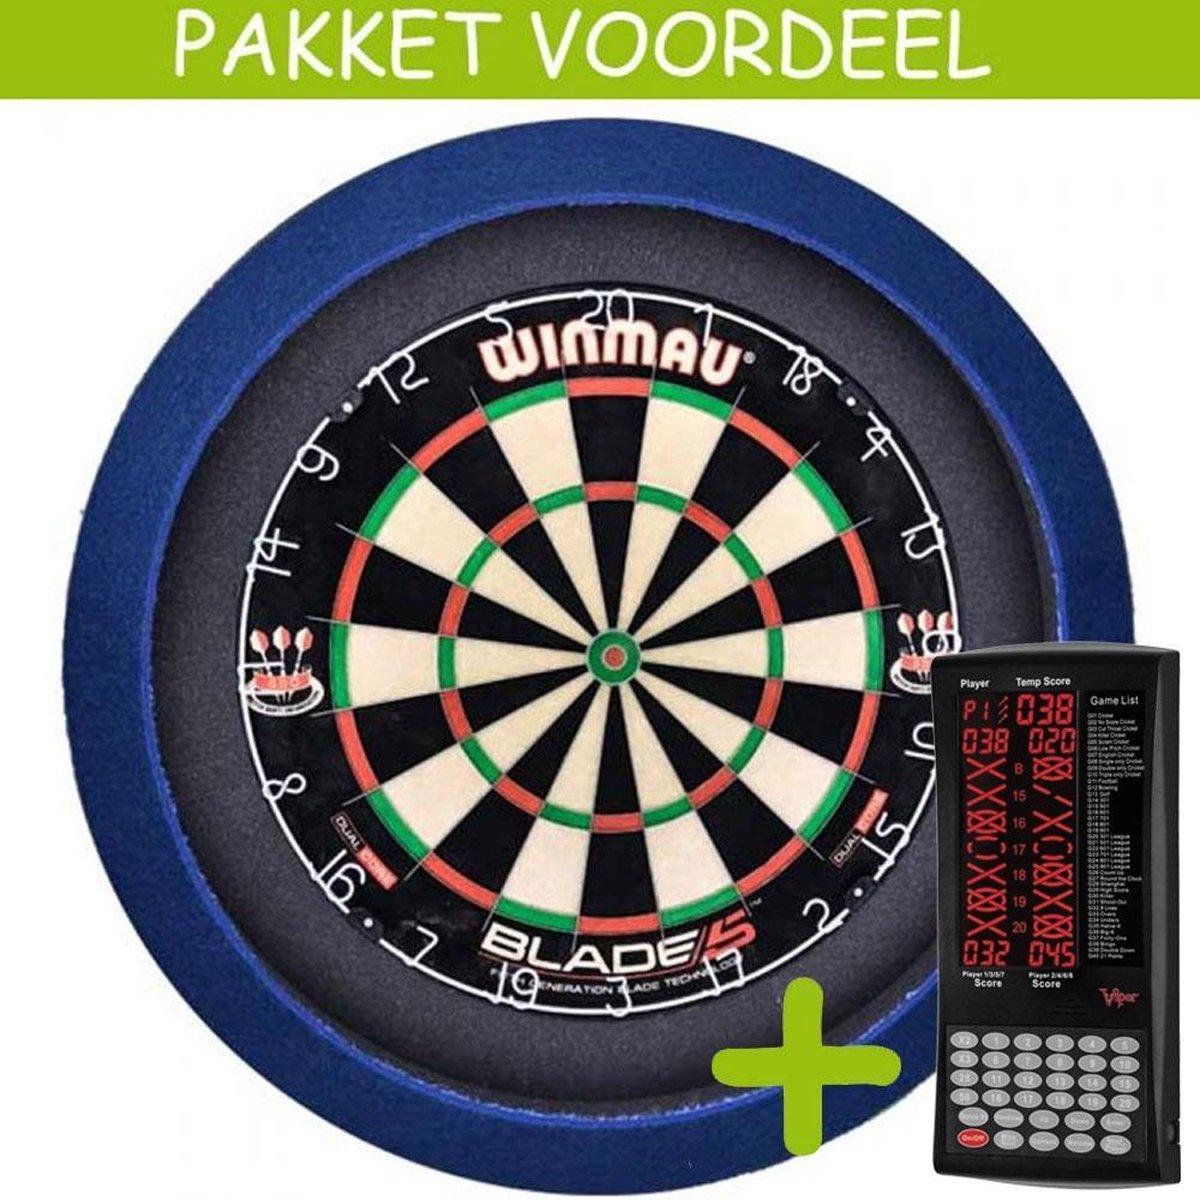 Elektronisch Dart Scorebord VoordeelPakket (Viper ) - Blade 5 - Dartbordverlichting Basic (Blauw)